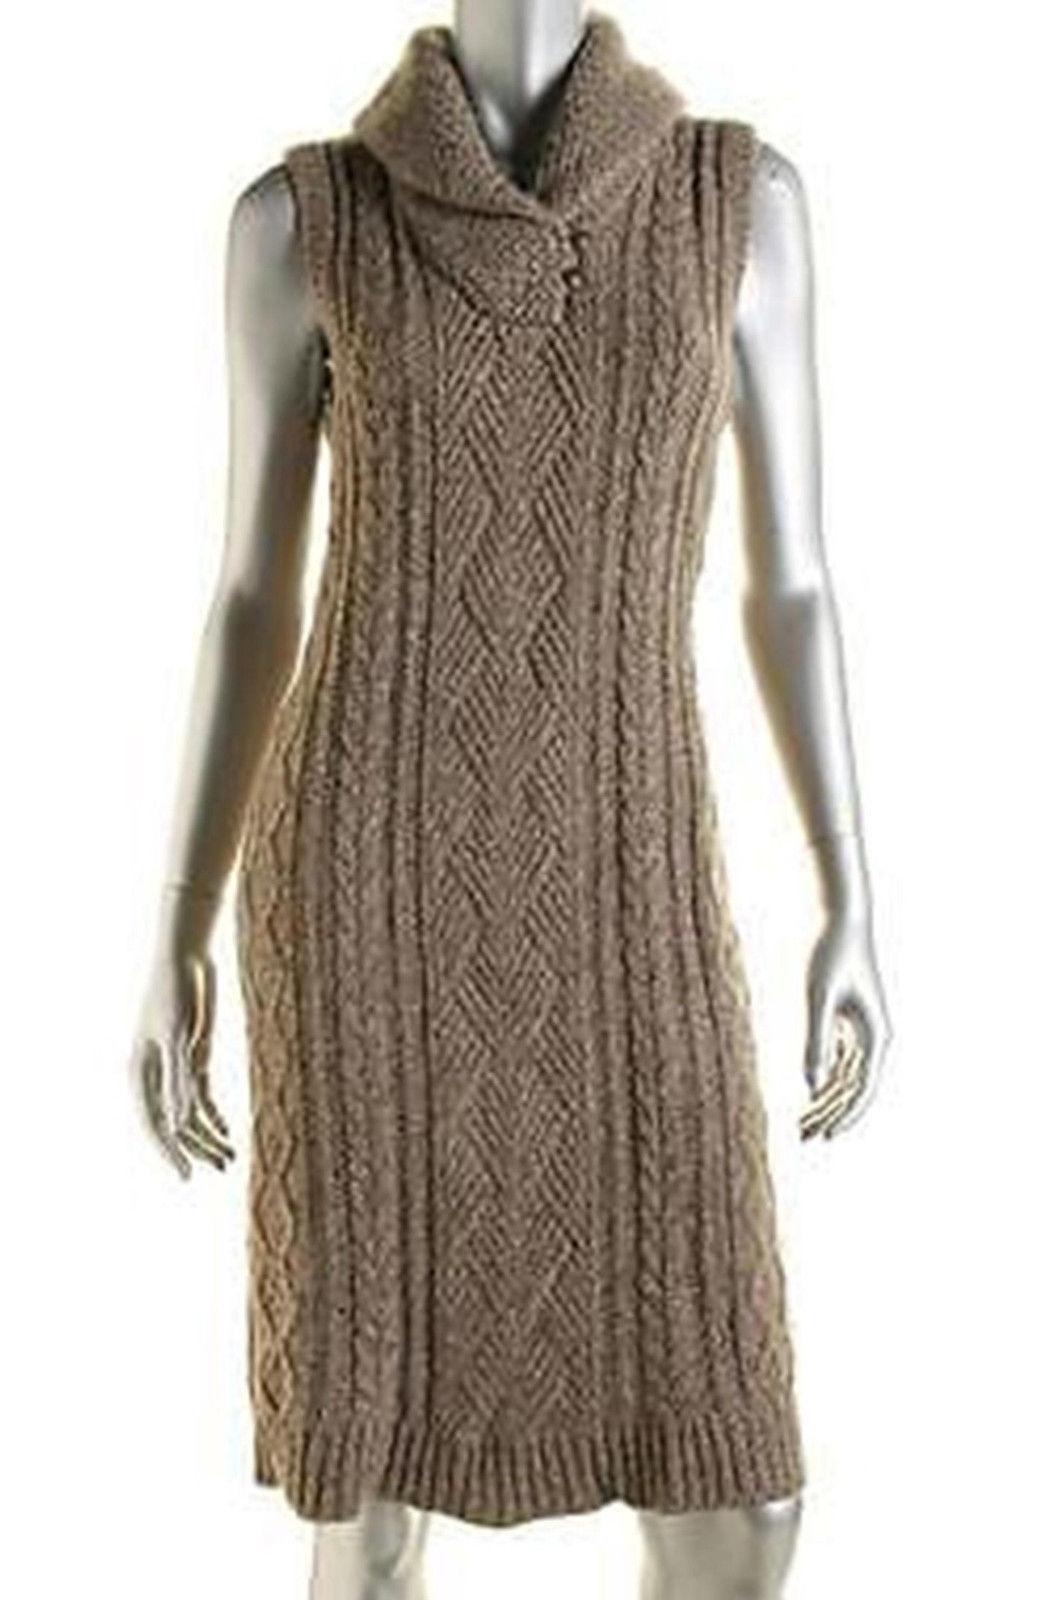 LRL Lauren Jeans Co. Womens Brown Knit Marled Wool Blend Sweater dress Size S